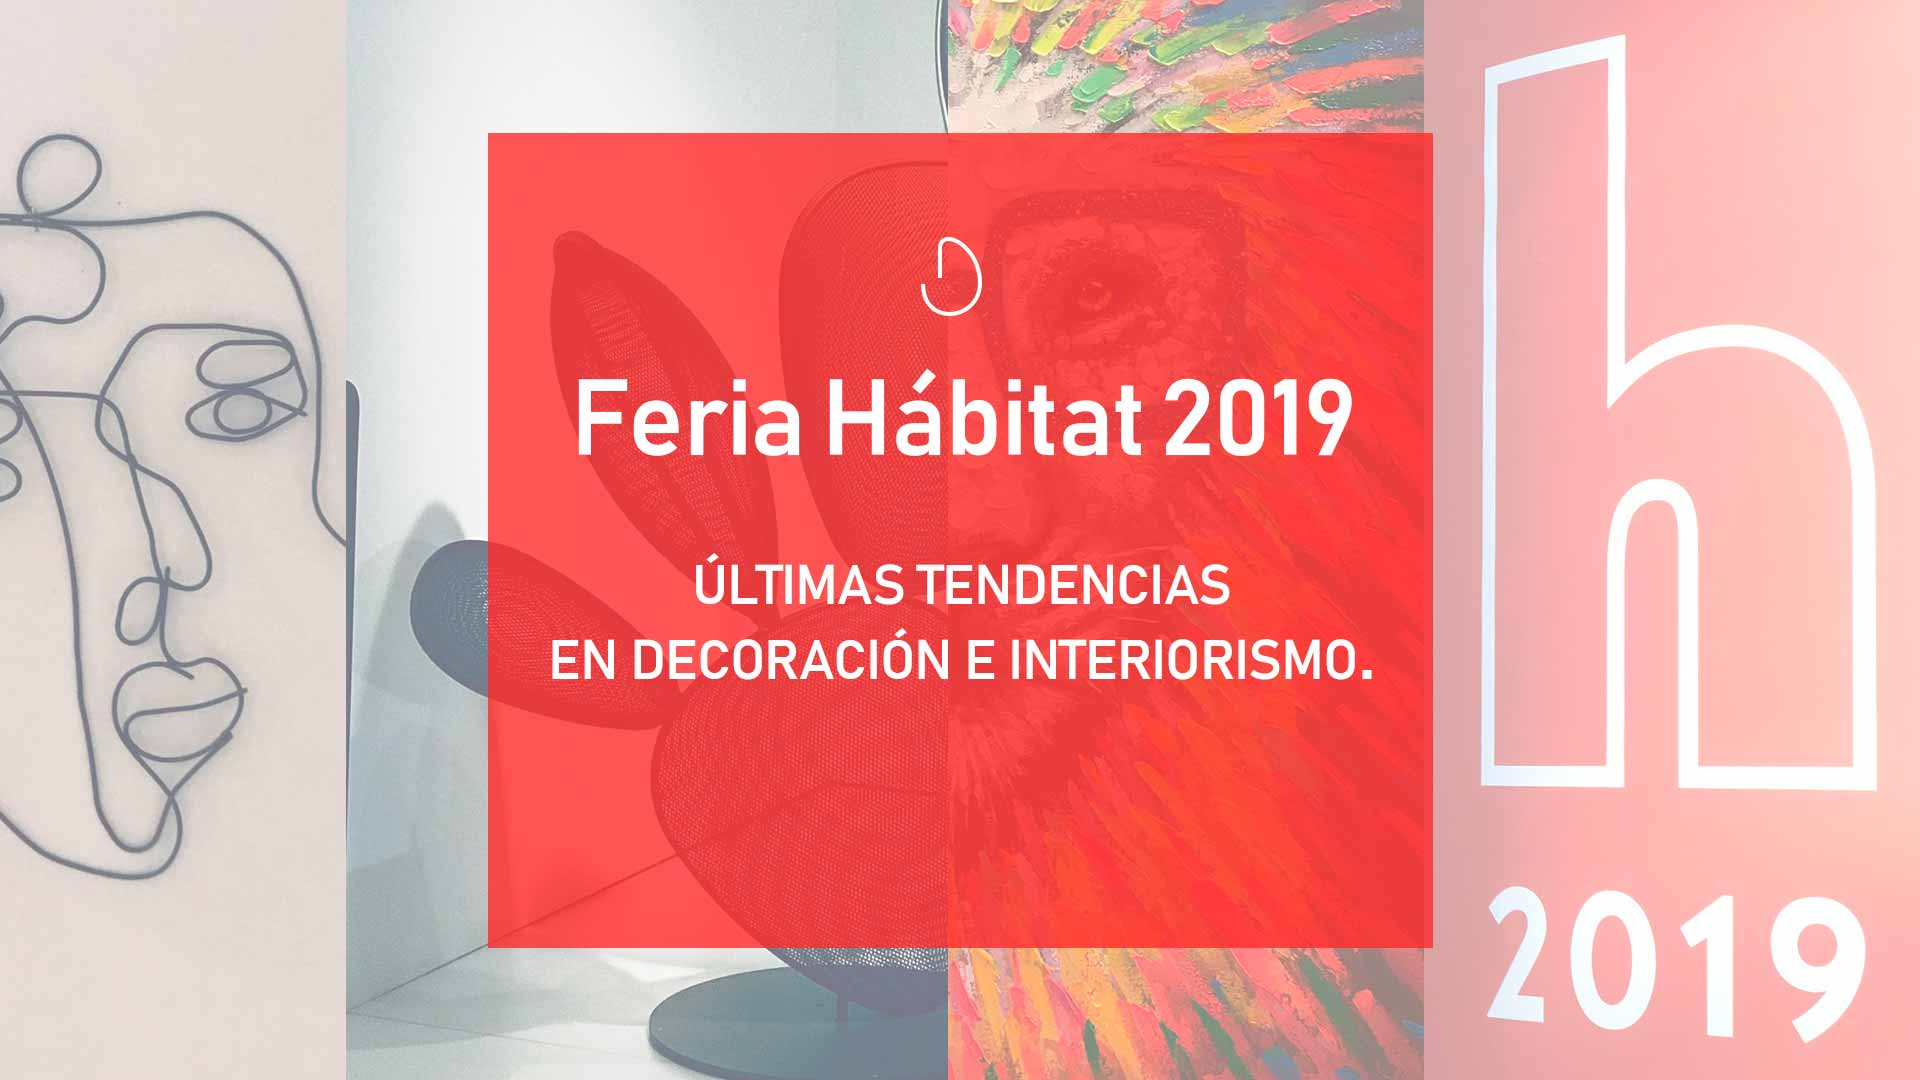 feria-hábitat-2019-blog-reforma-pamplona